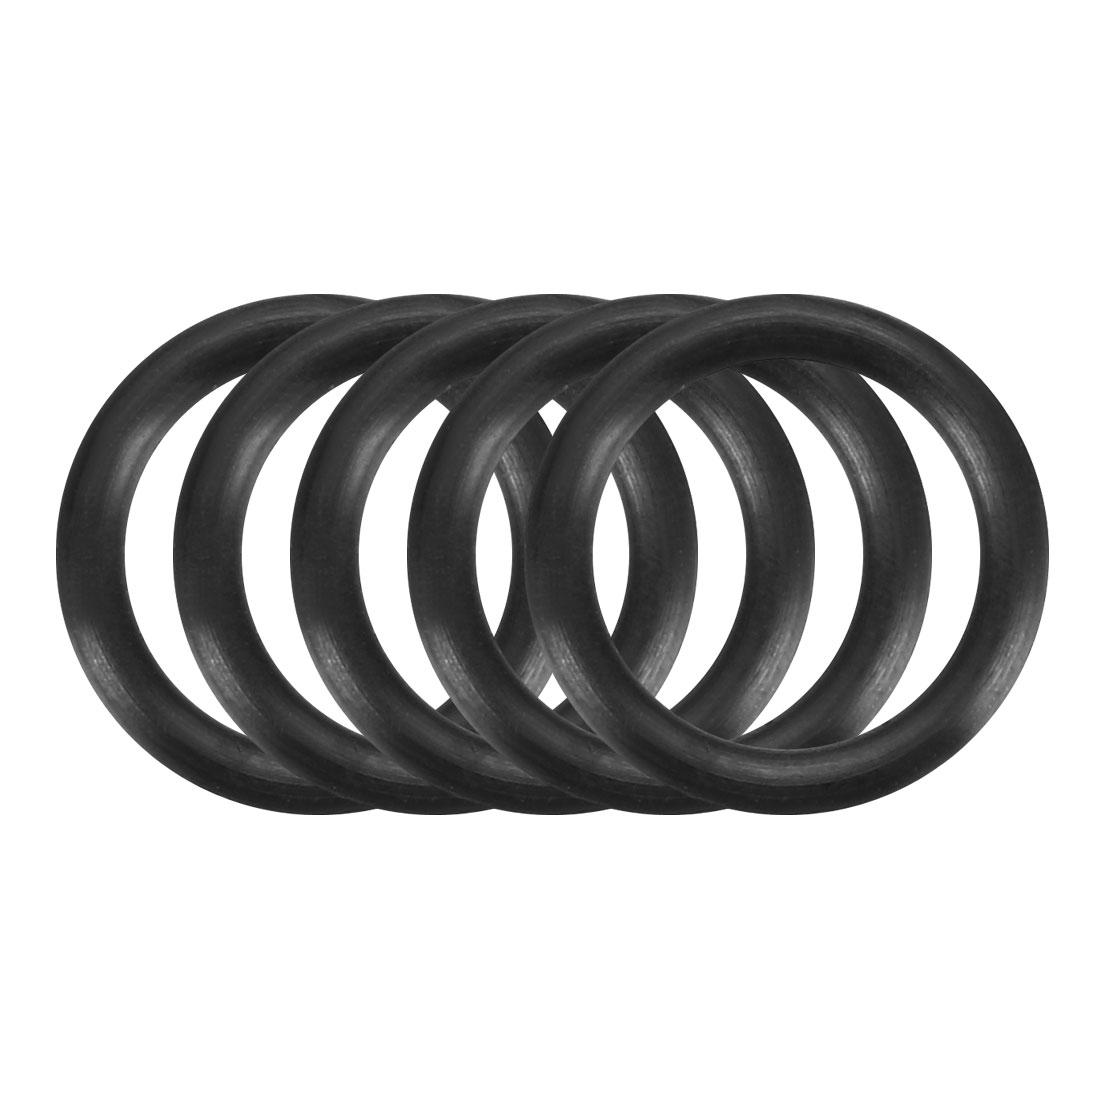 100Pcs Black 11mm x 1.5mm Nitrile Rubber O Ring NBR Oil Sealing Grommets